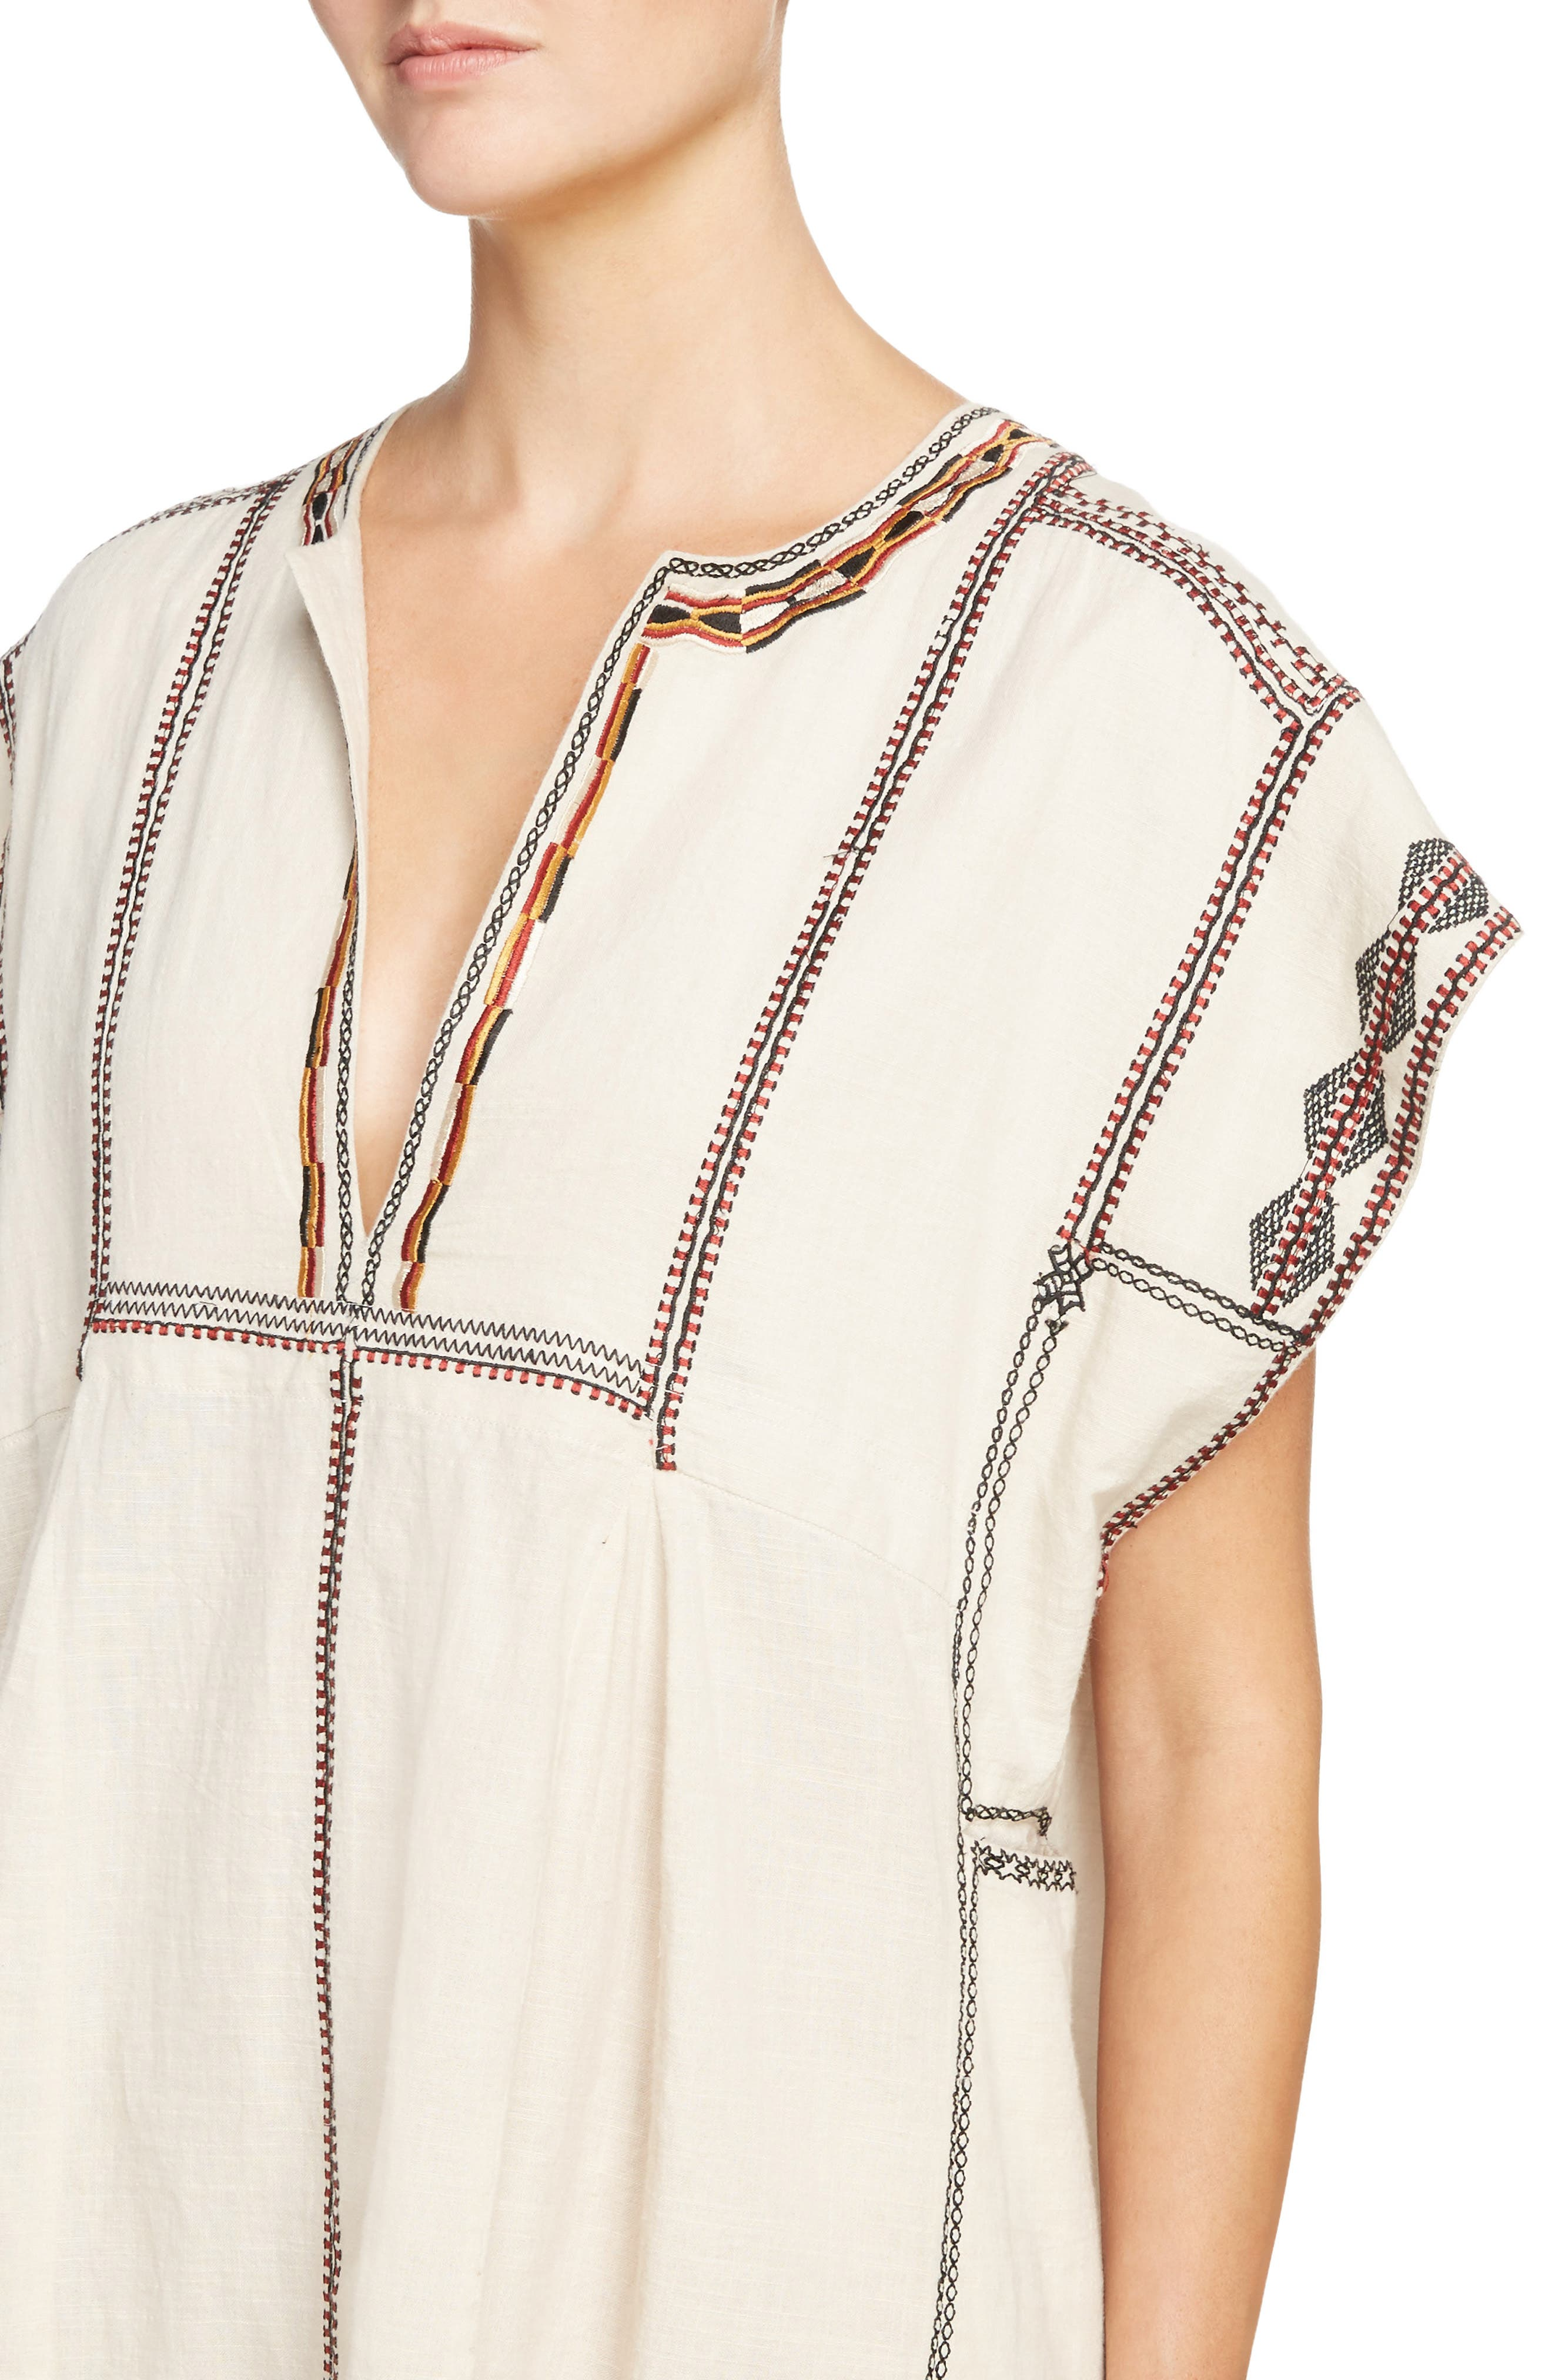 Isabel Marant Étoile Belissa Embroidered Shift Dress,                             Alternate thumbnail 4, color,                             Beige